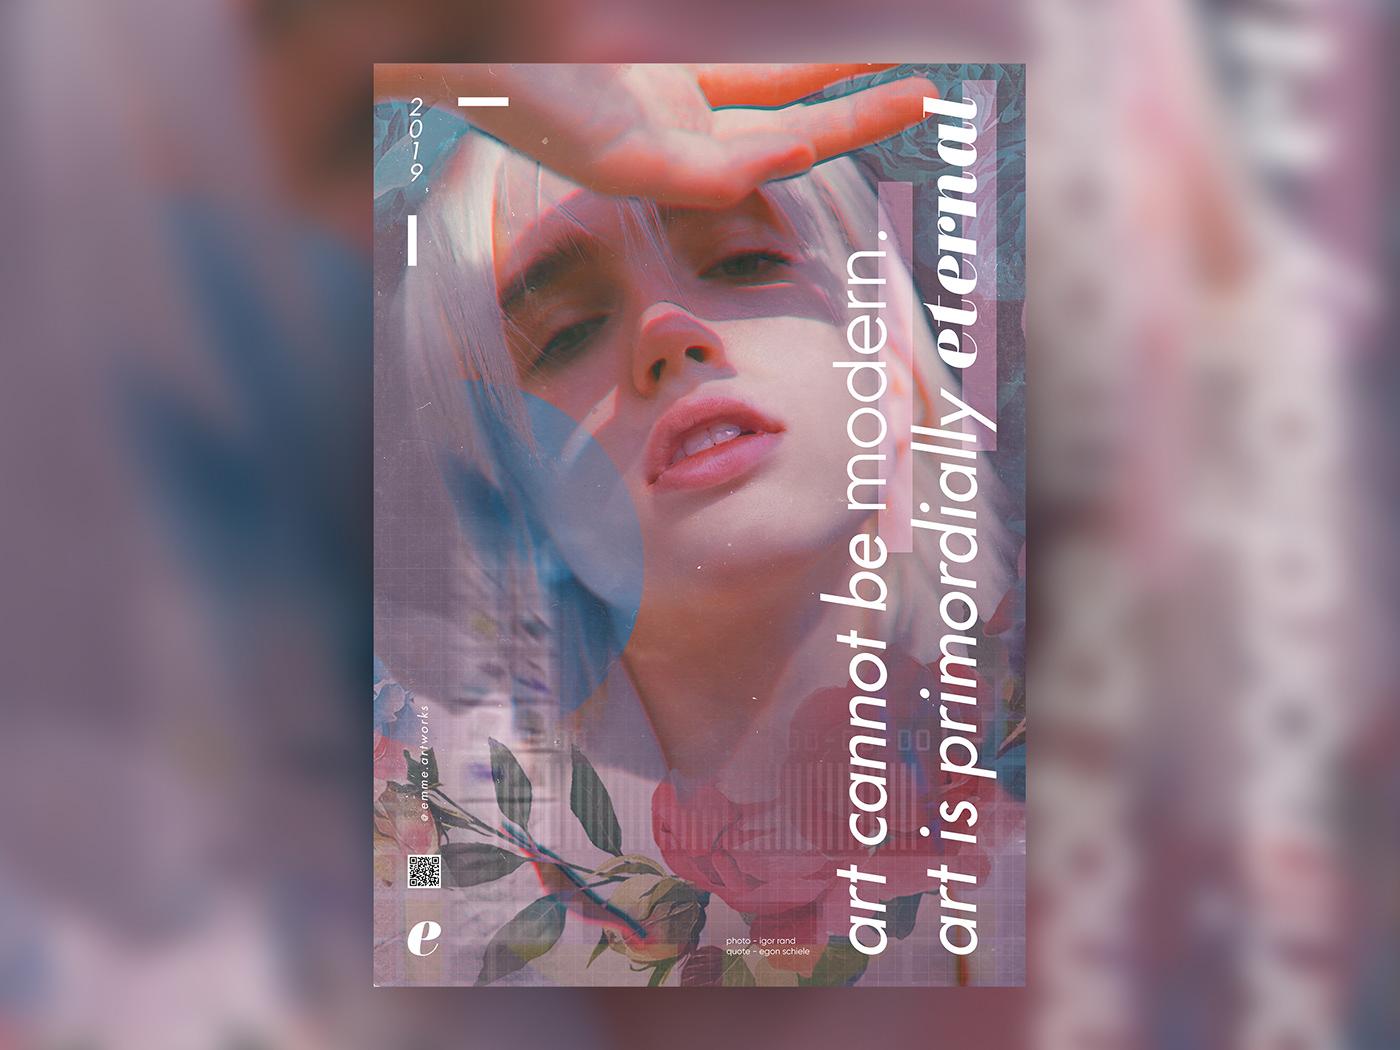 artwork art Digital Art  Photo Manipulation  Matte Painting music album Music Artwork artistic visual art